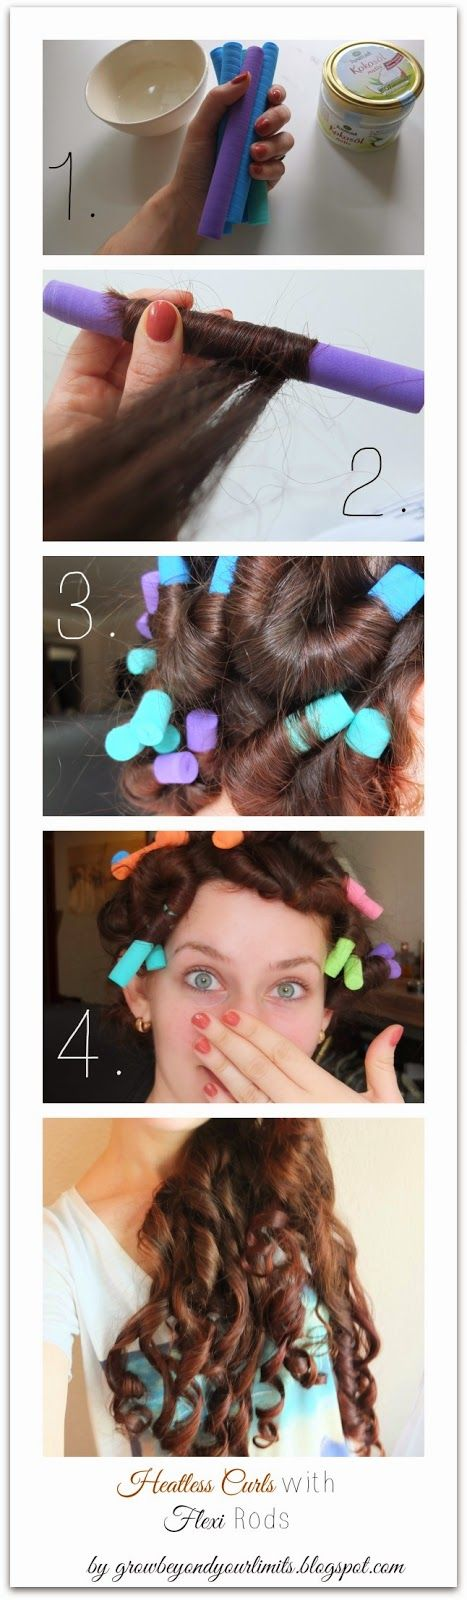 Grow Beyond Your Limits: Flechtwerk: Heatless Curls with Flexi Rods                                                                                                                                                                                 More